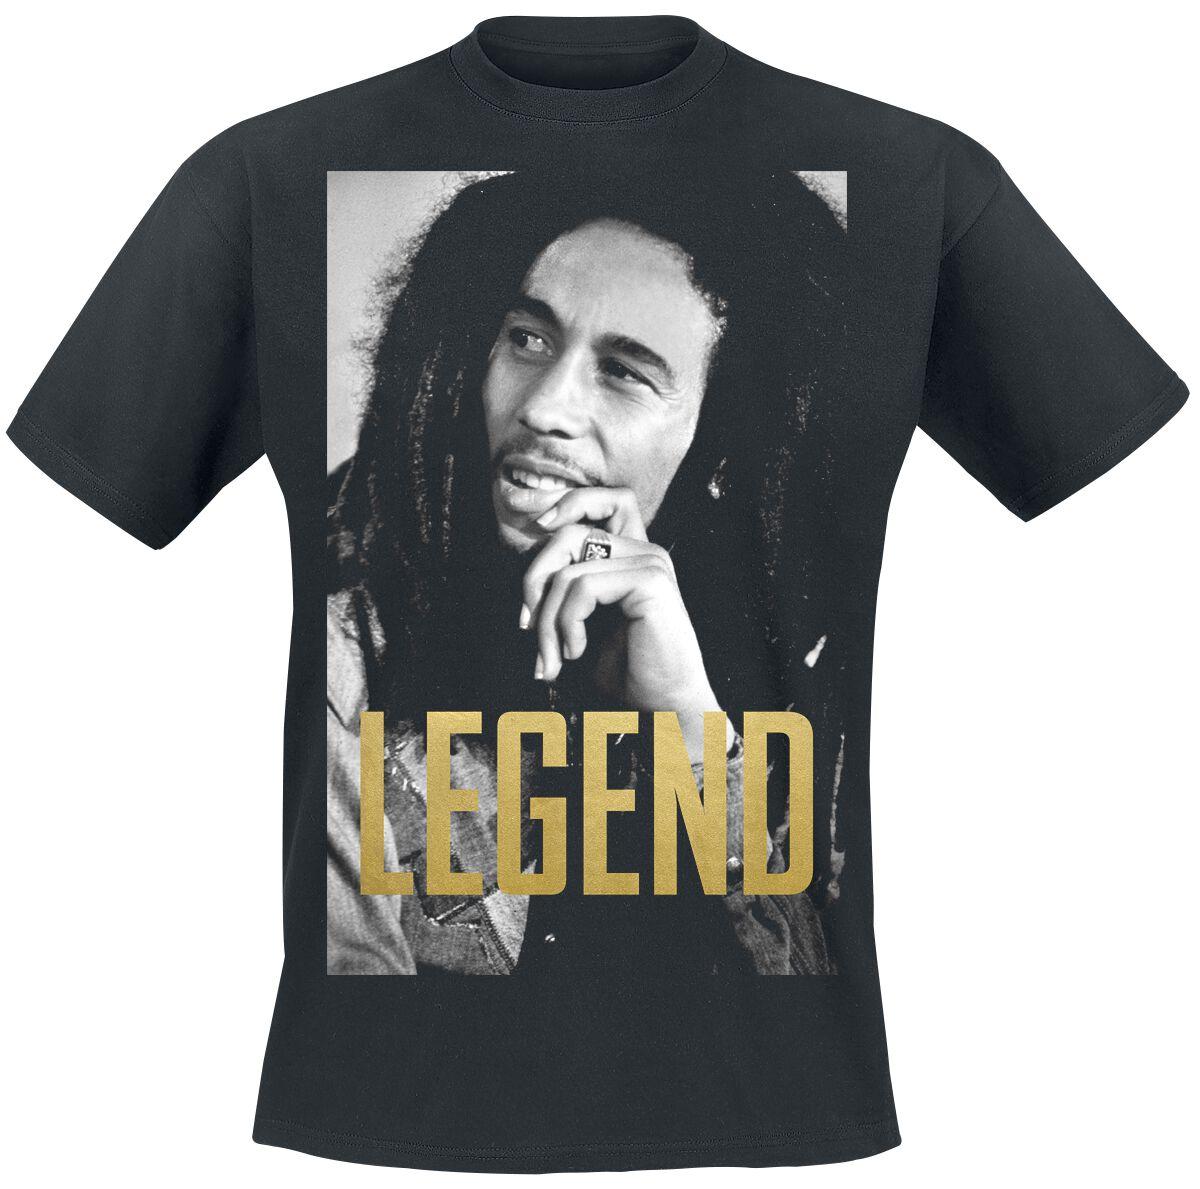 Zespoły - Koszulki - T-Shirt Bob Marley Legend Portrait T-Shirt czarny - 369708